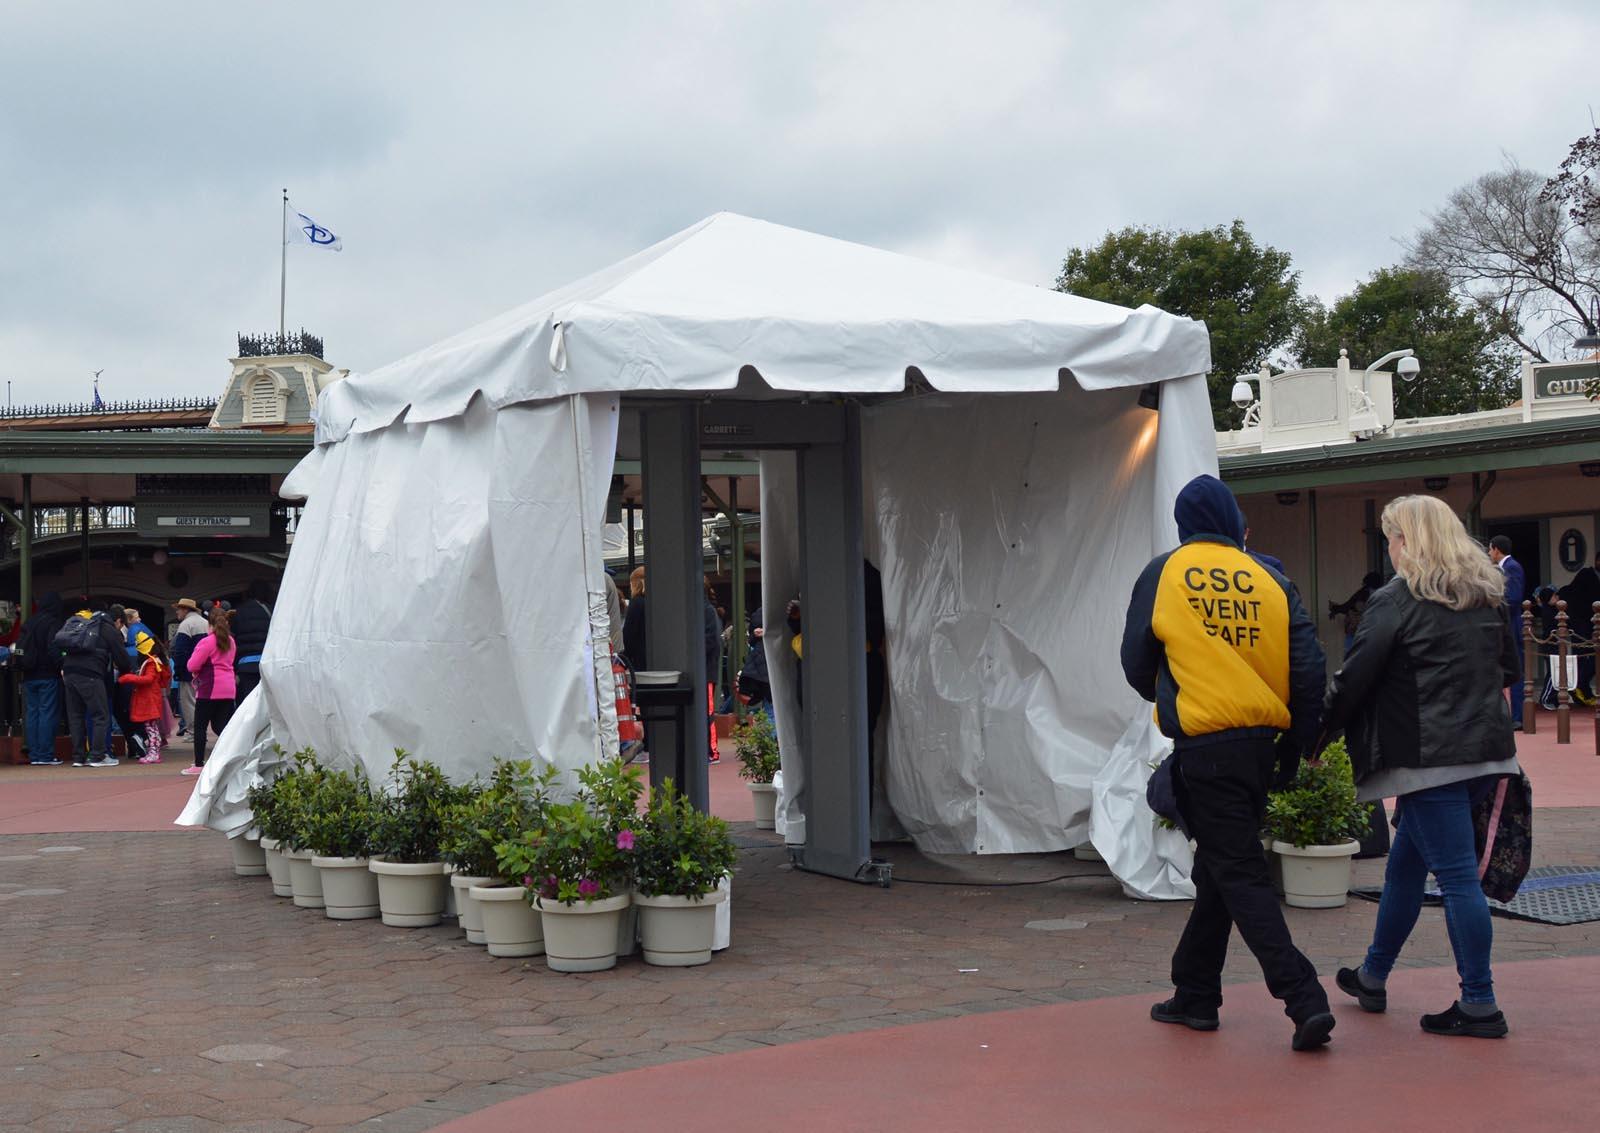 Hereu0027s a look at the new(er) security measure being taken at Walt Disney & Todayu0027s Disney photo: Metal detector at Magic Kingdom u2013 A GATOR IN ...